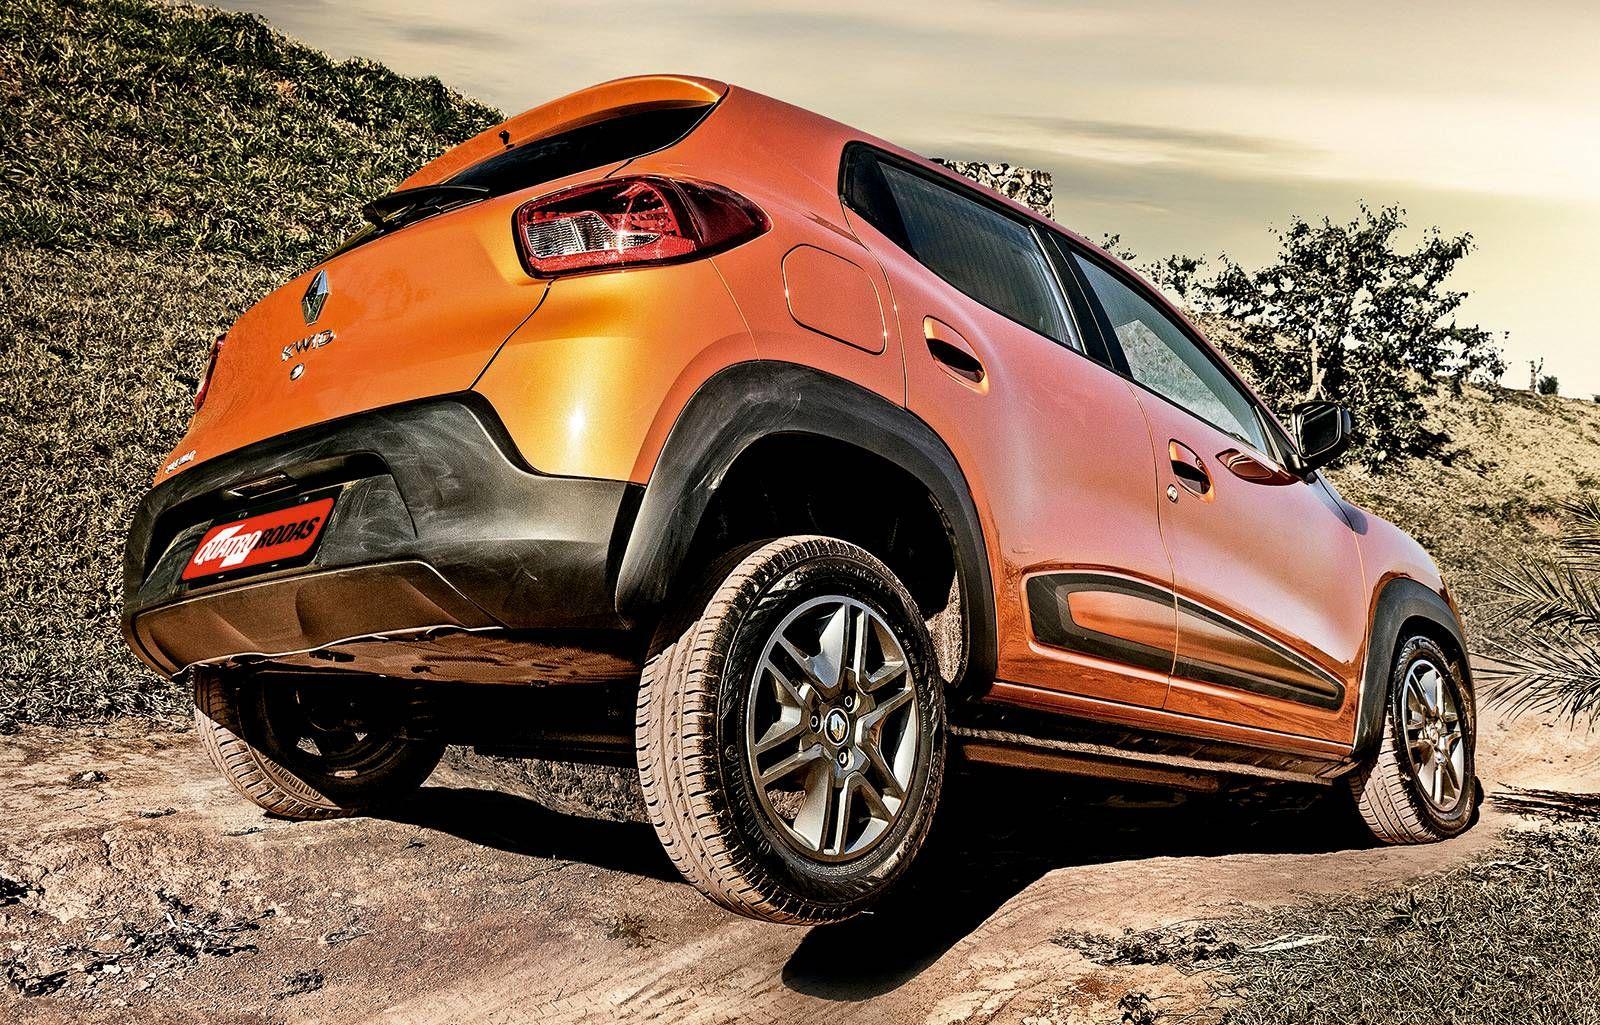 Teste Renault Kwid Jeep Renegade E Honda Wr V Caem Na Trilha